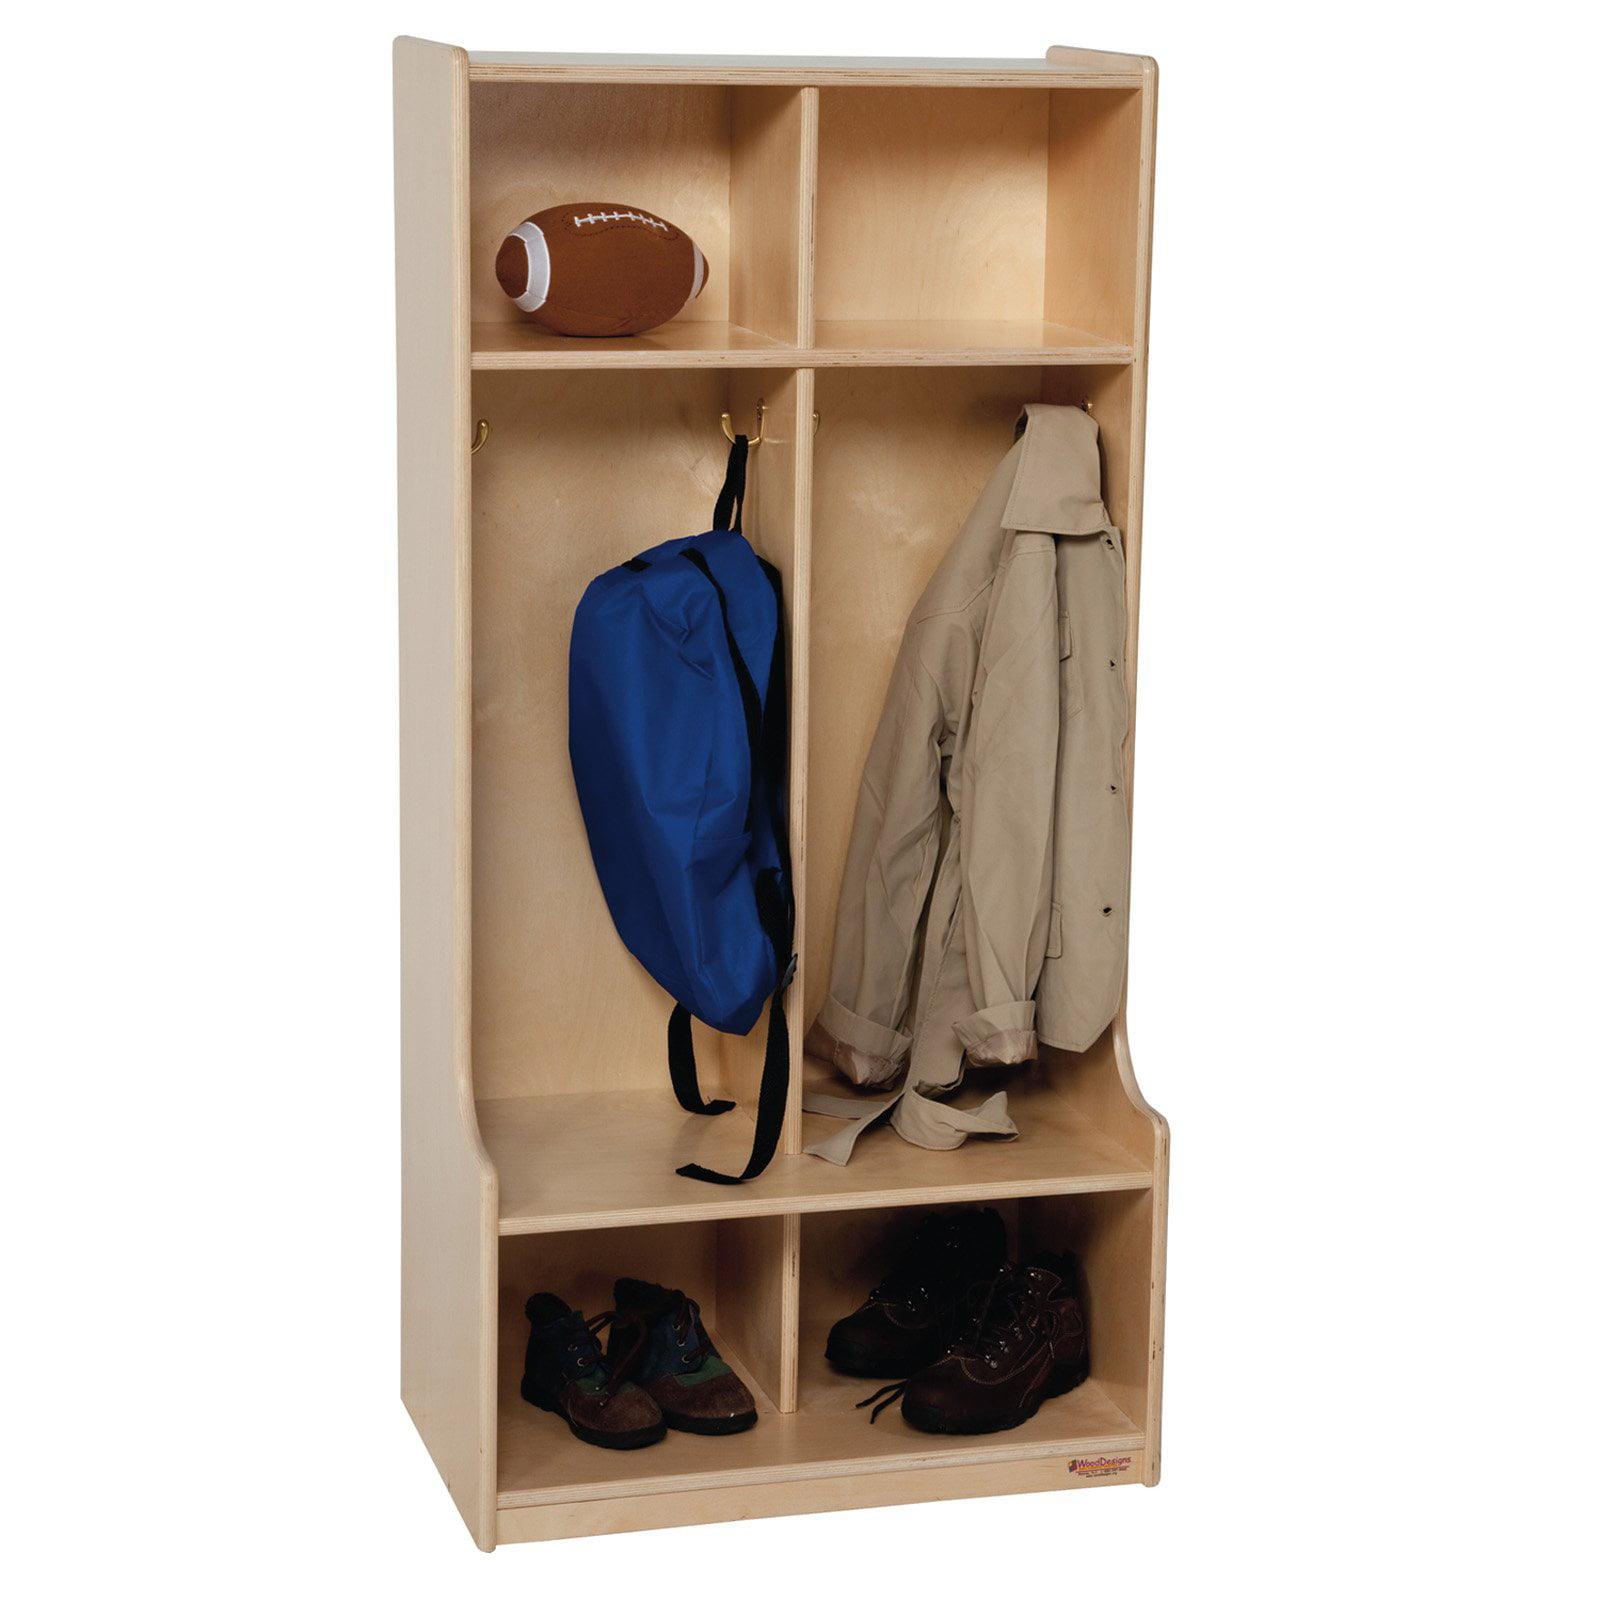 Wood Designs 2 Section Locker - Natural